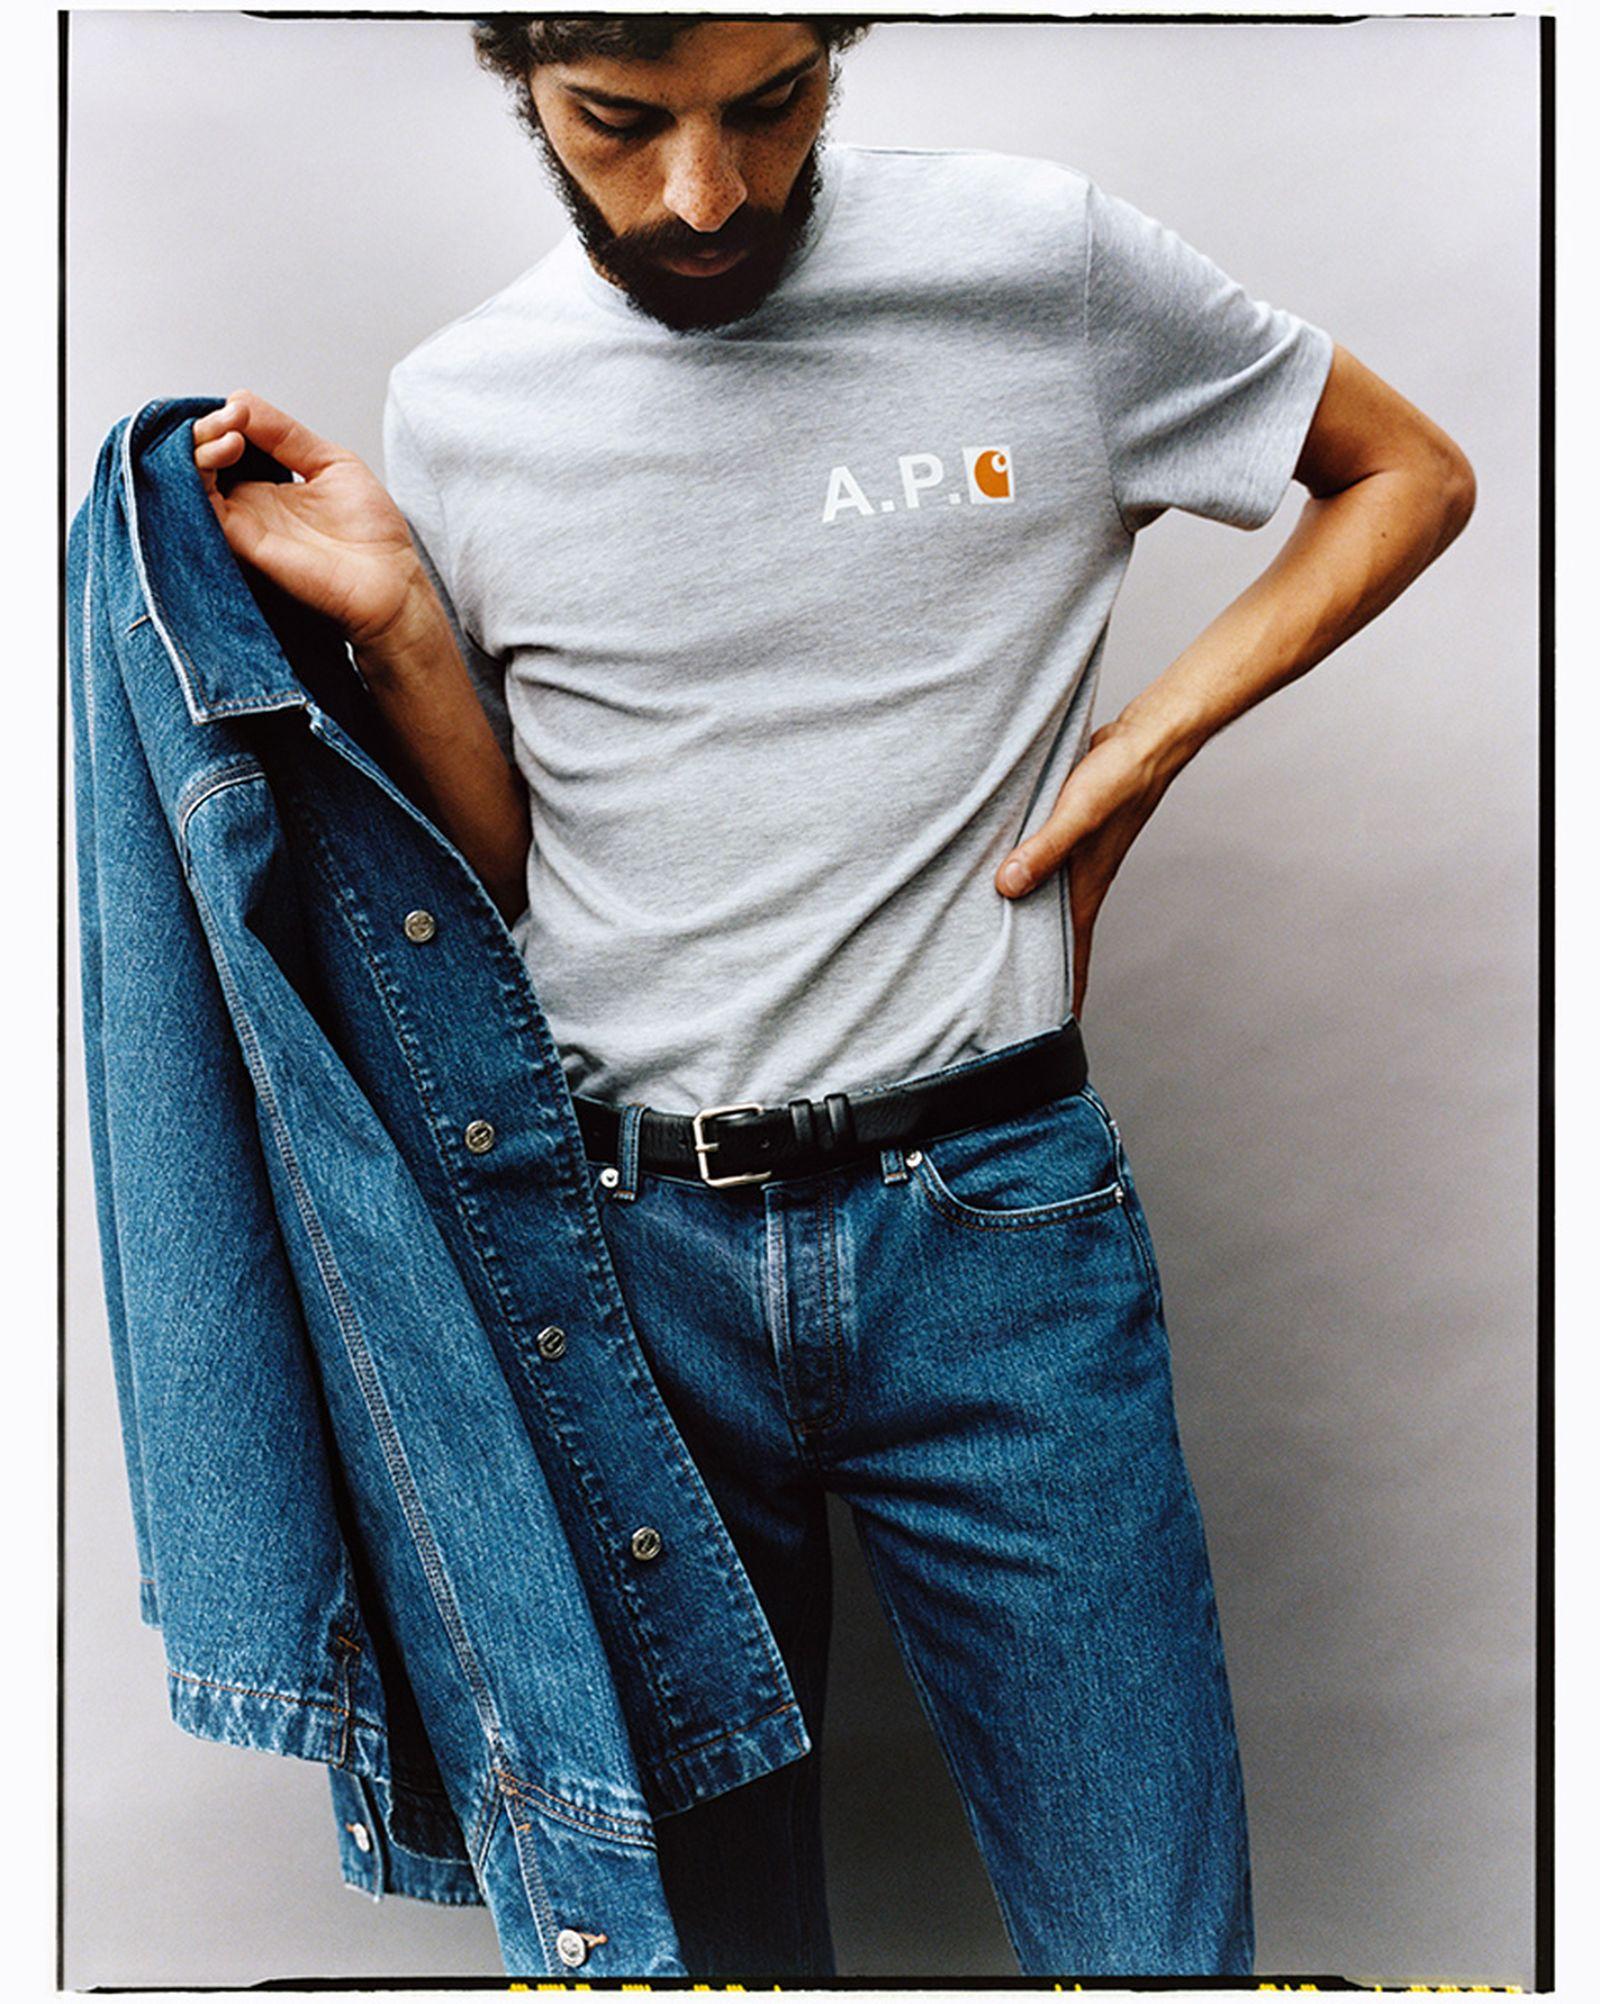 A.P.C. x Carhartt WIP Grey T-Shirt and Blue Denim Jacket